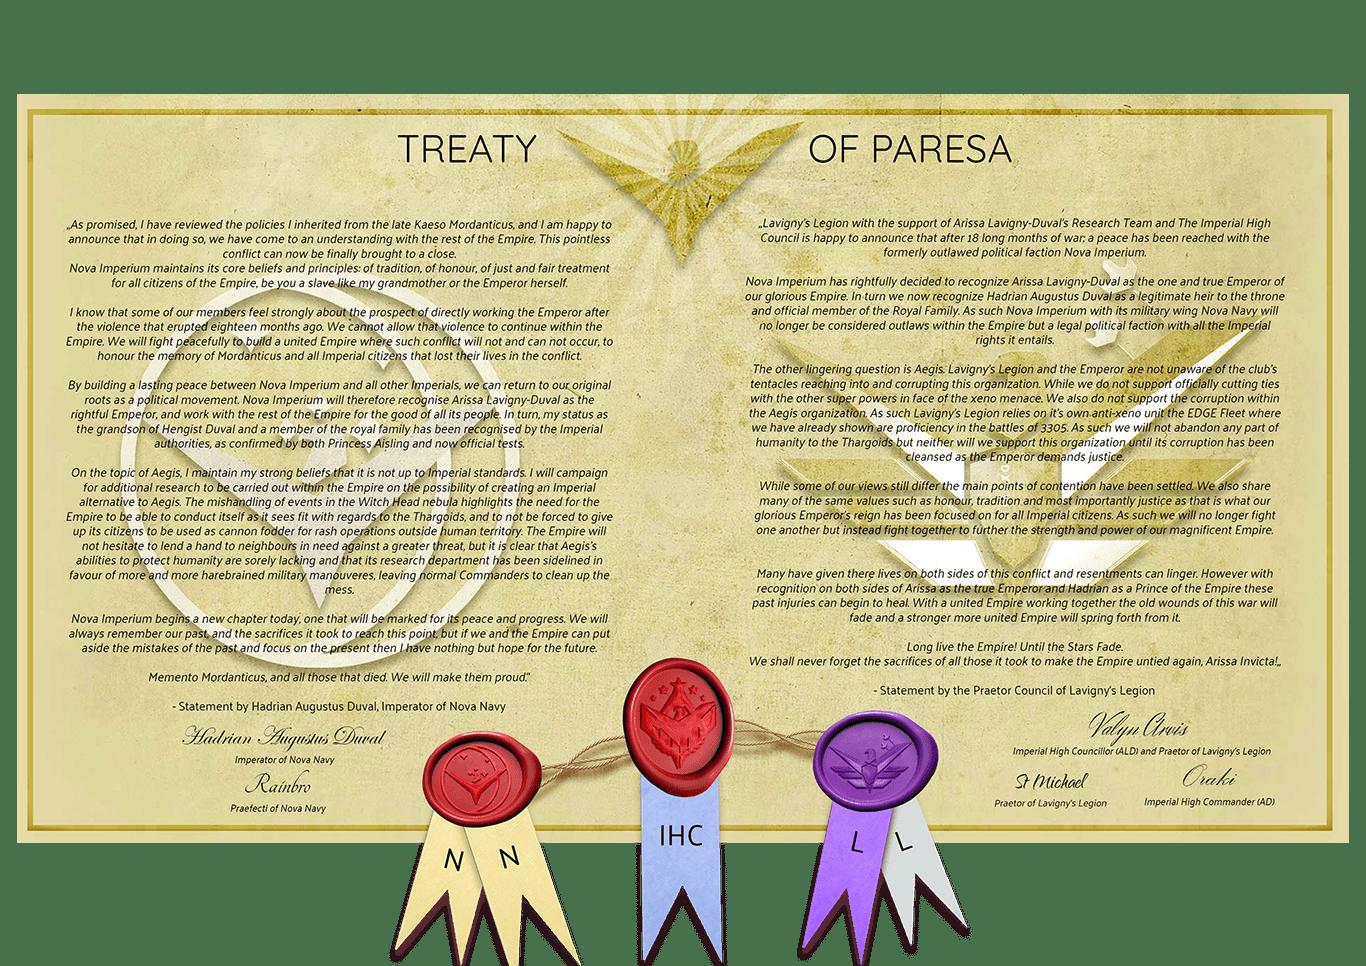 Treaty of Paresa - S - Forum - 16-06-3306-min.png